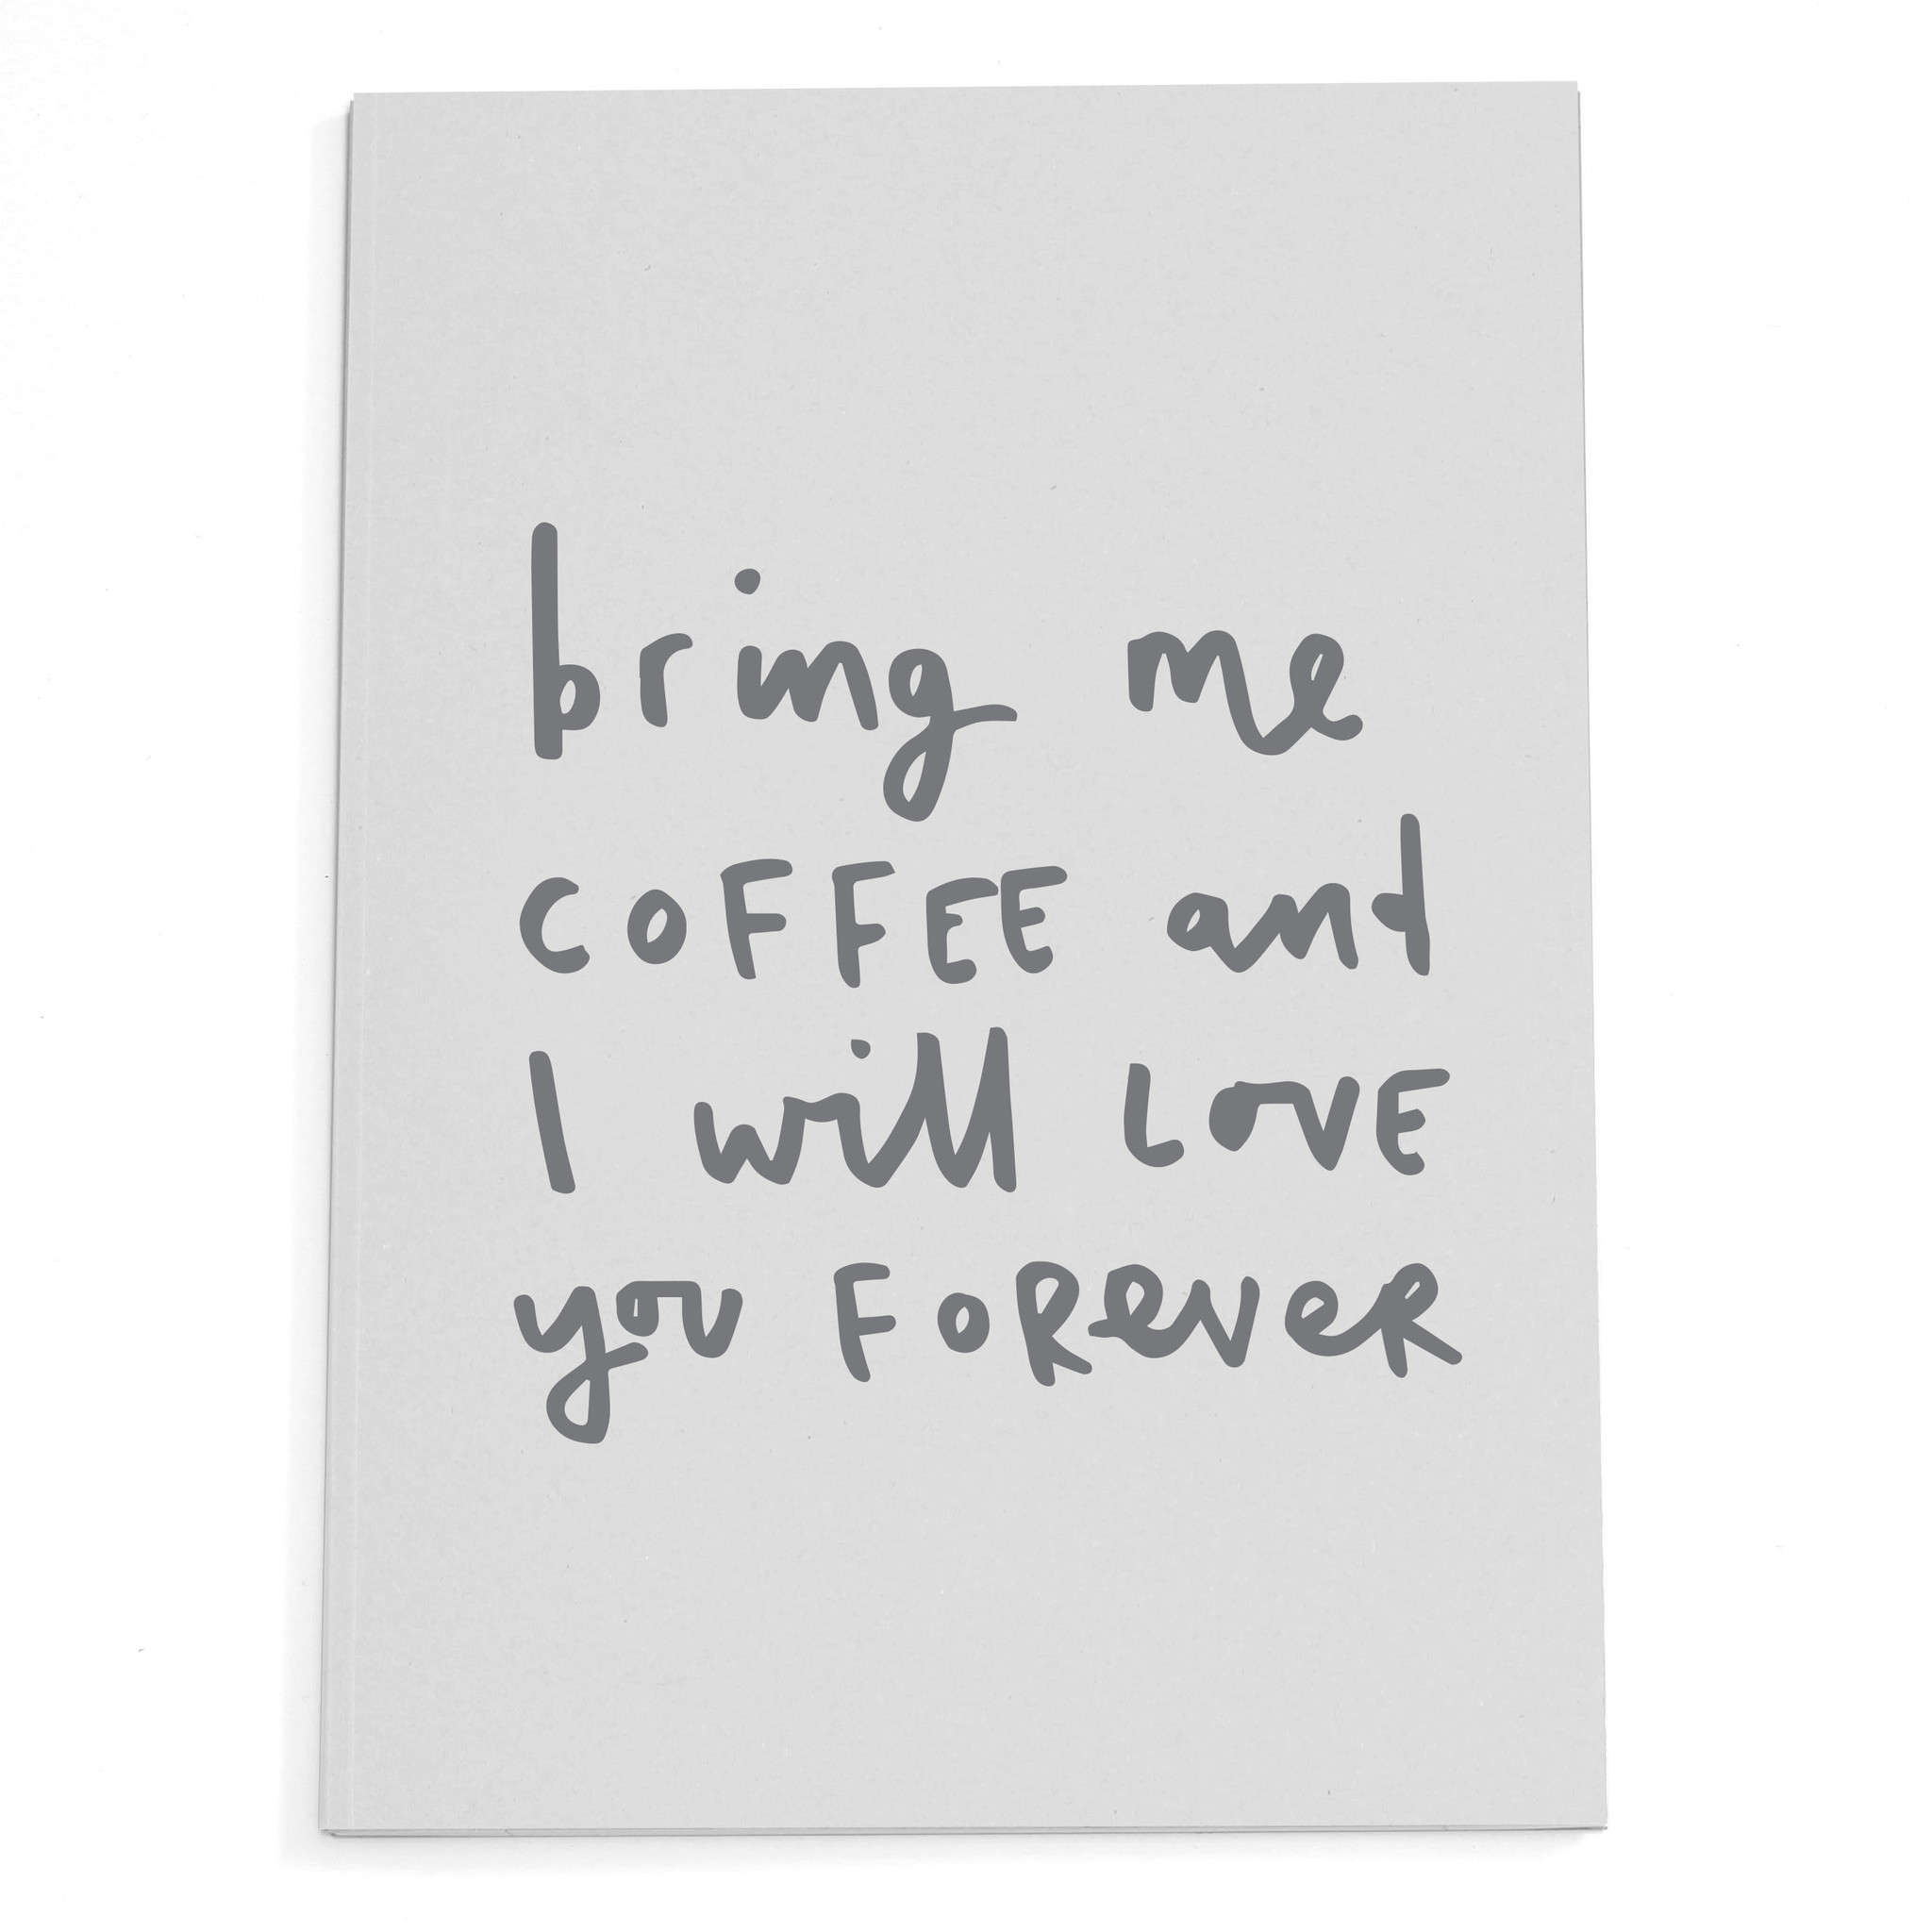 bring-me-coffee-a5-grey-notebook.jpg